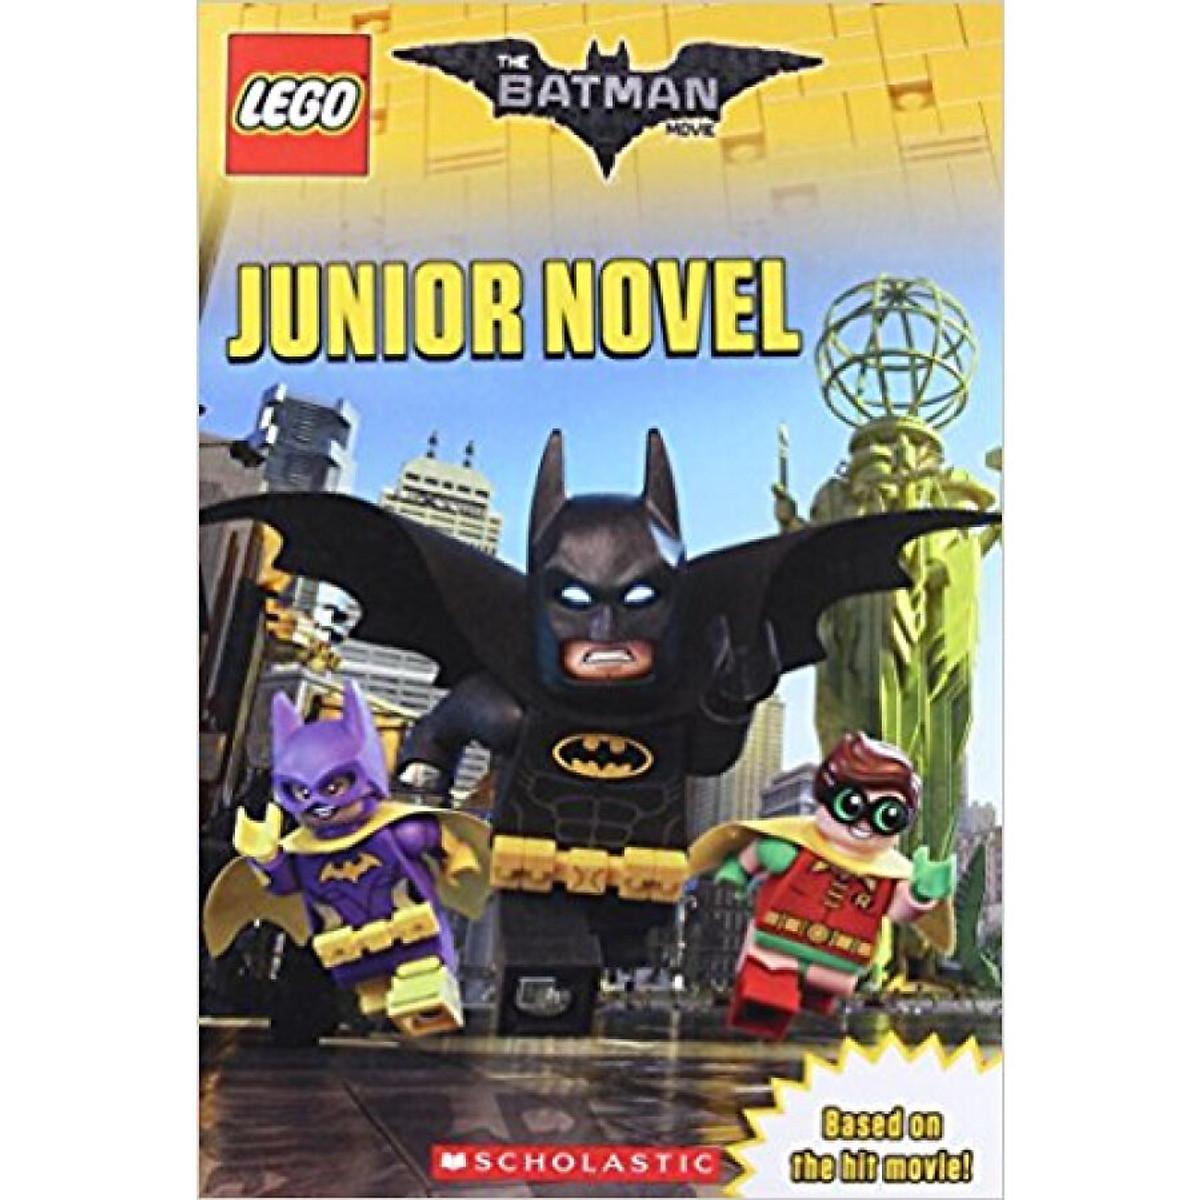 Hình đại diện sản phẩm Lego Batman Movie: The Junior Novel (Movie Tie-In)